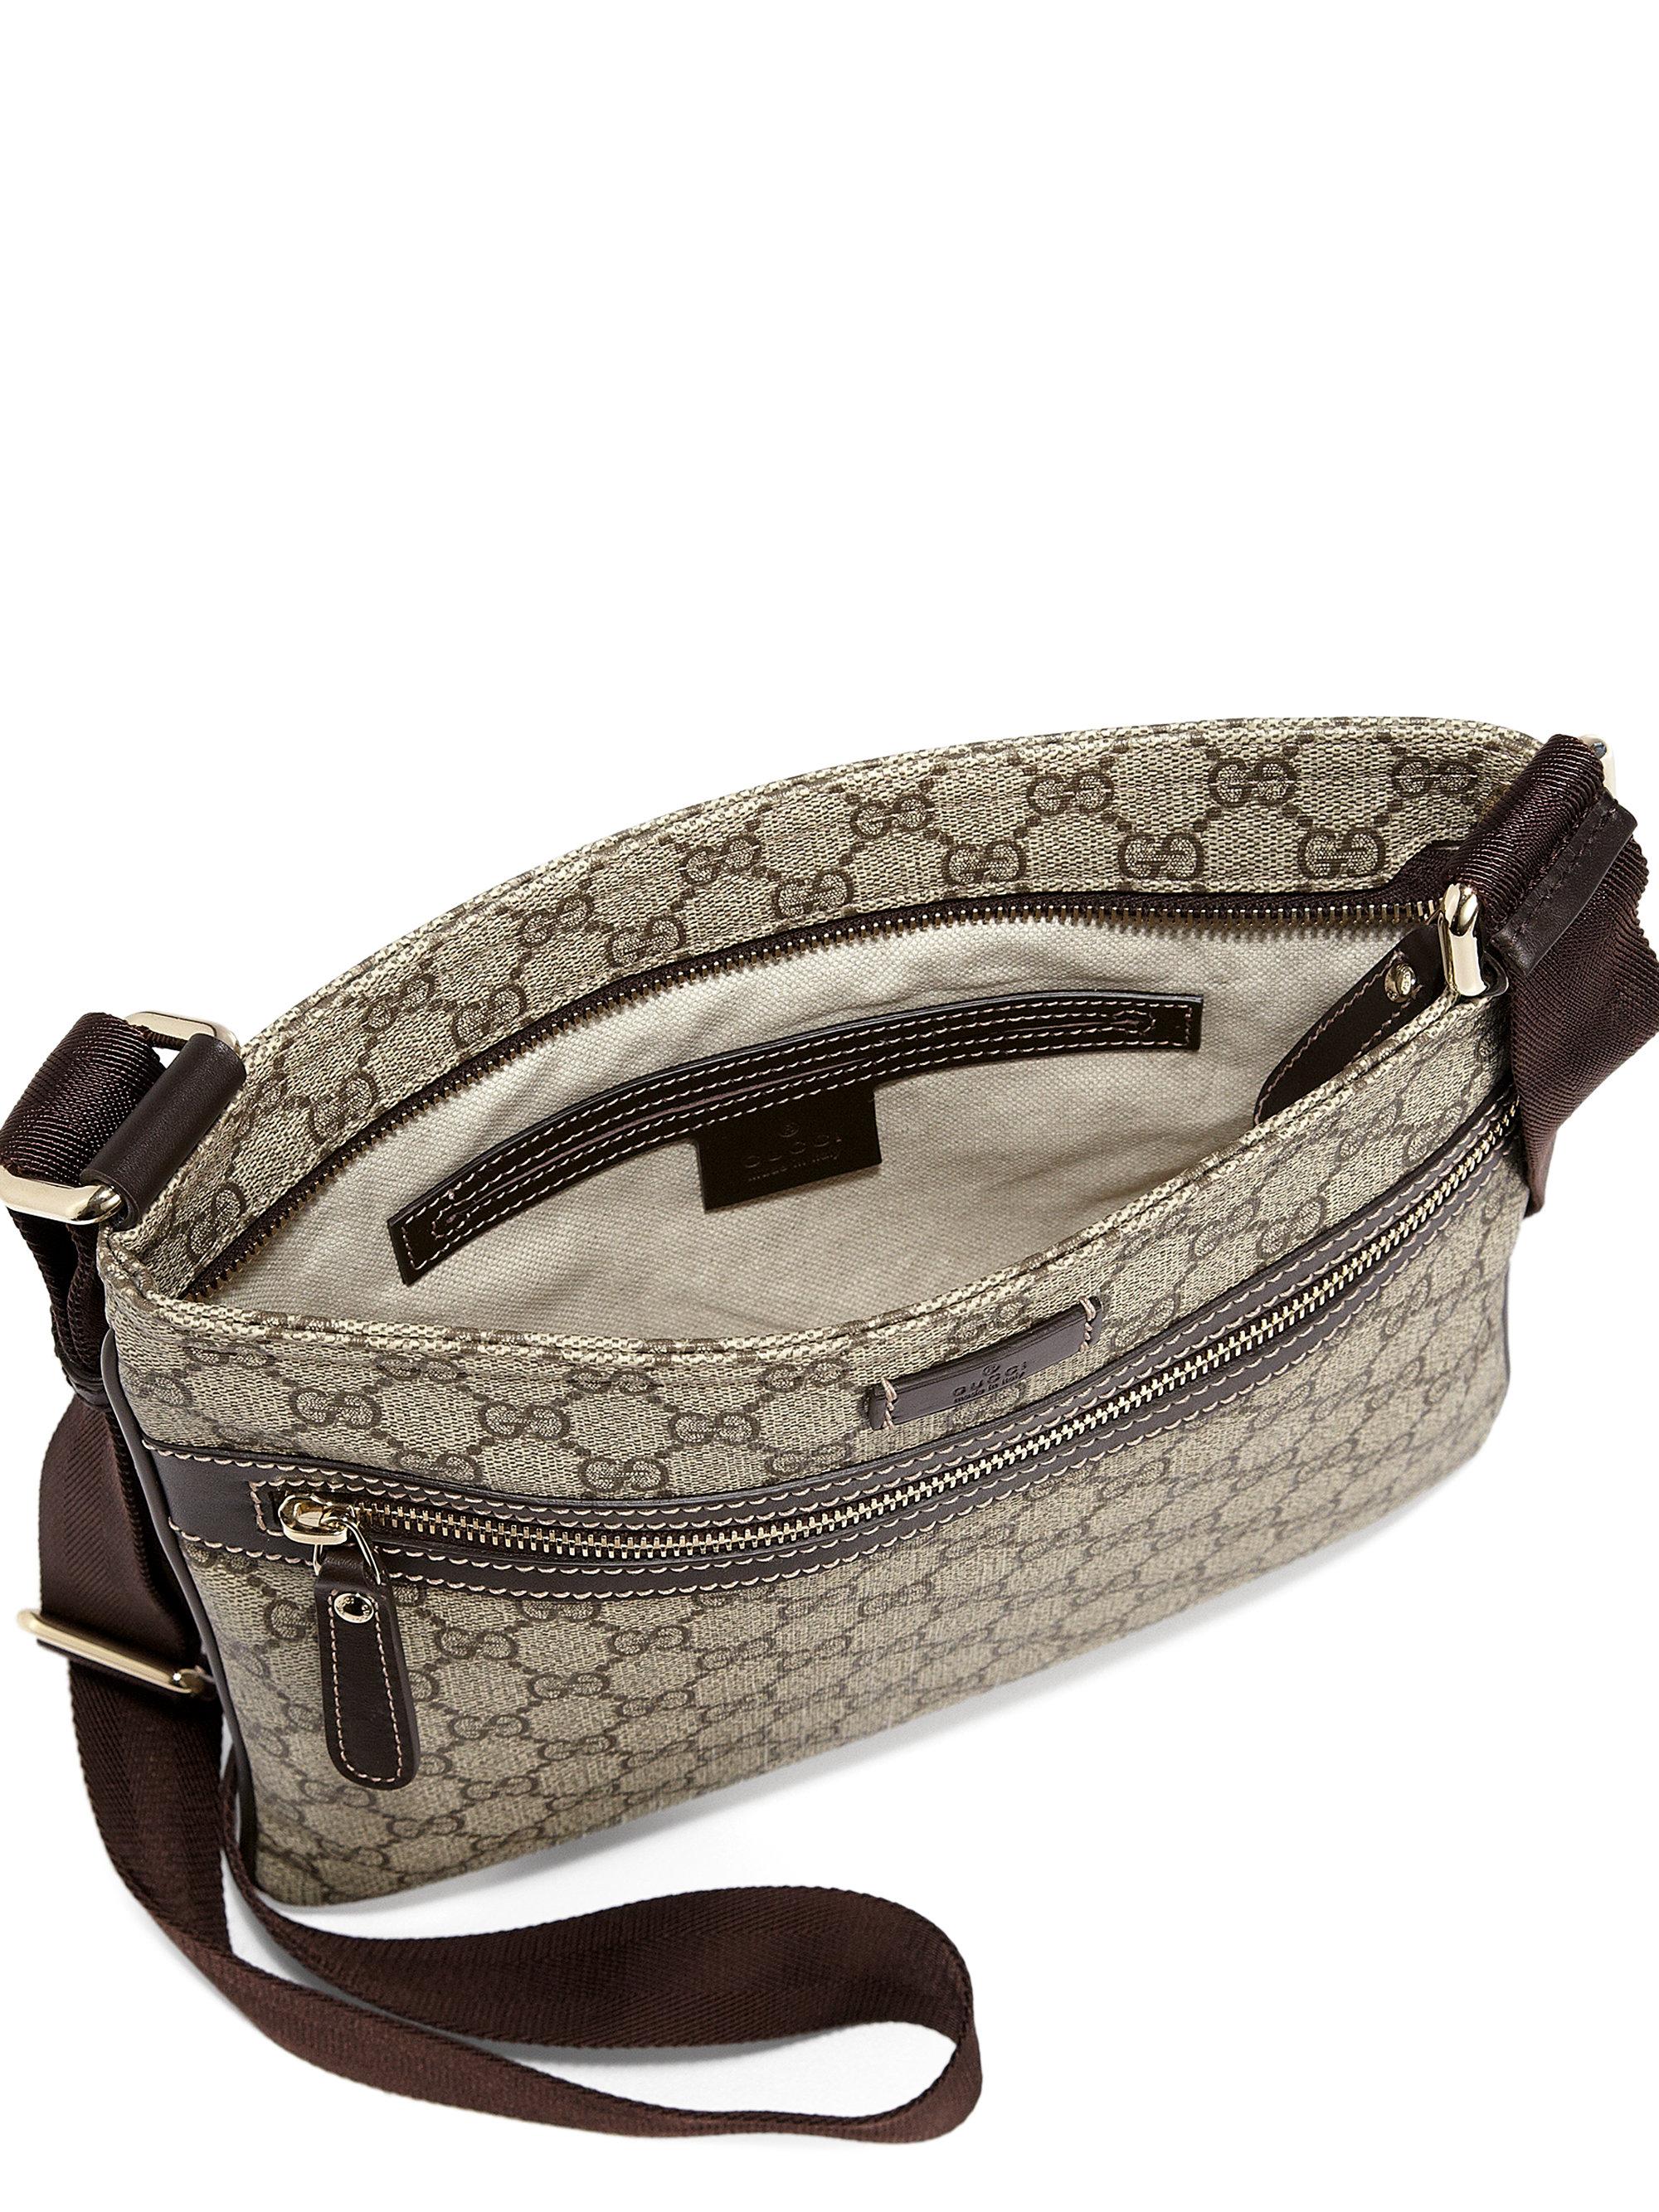 Gucci Joy GG Supreme Flat Messenger Bag in Brown | Lyst